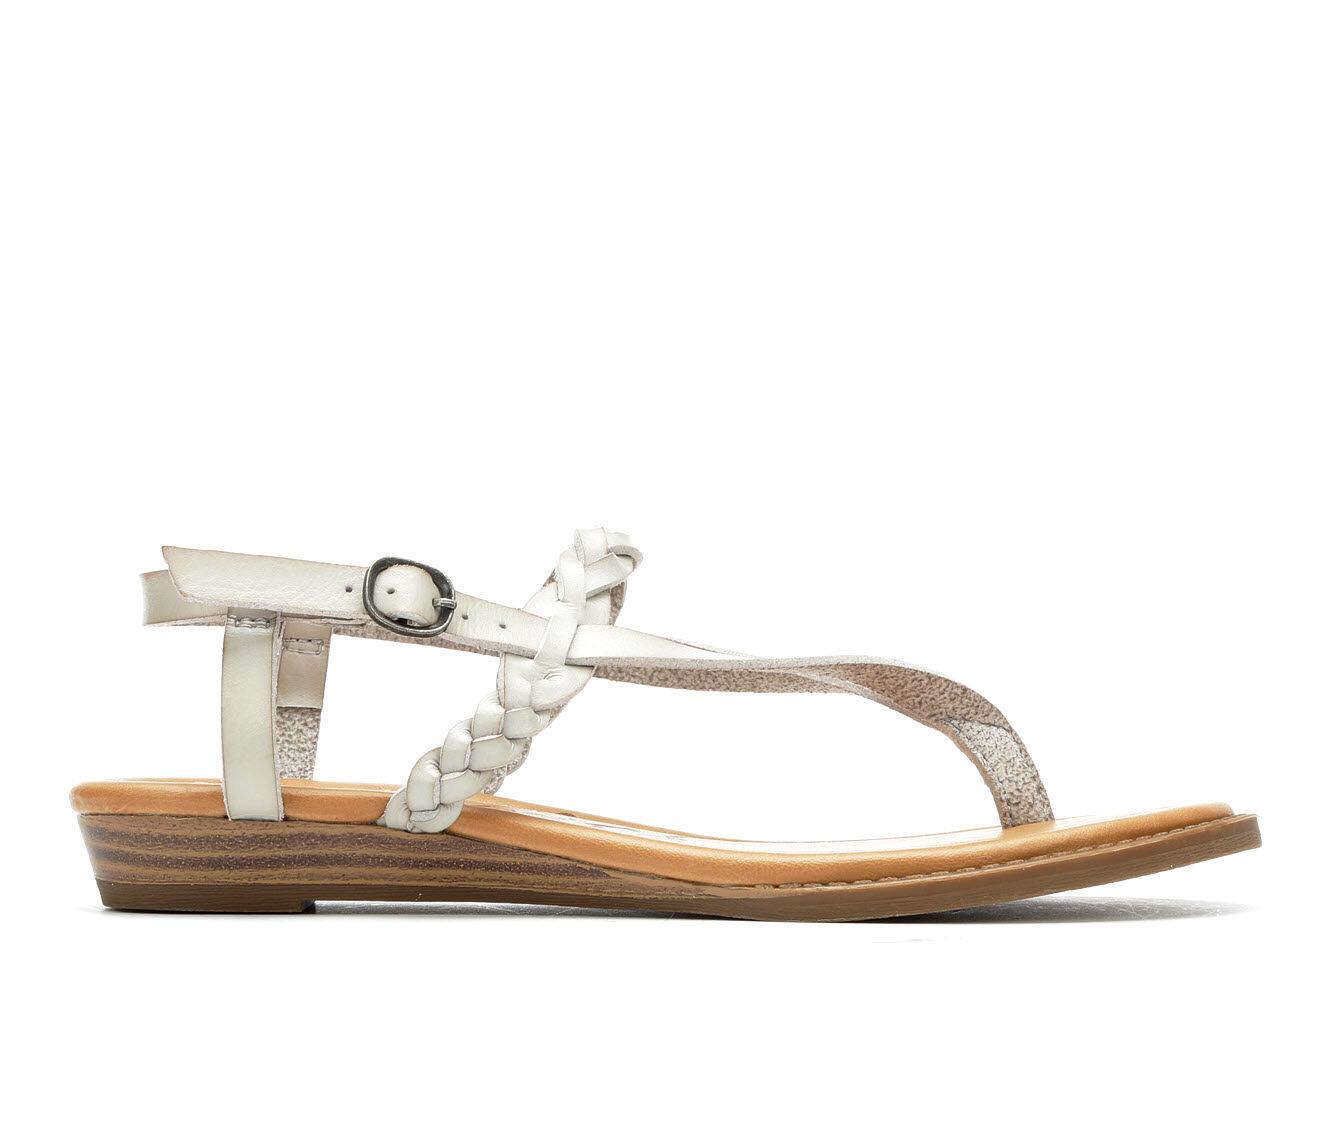 uk shoes_kd6610